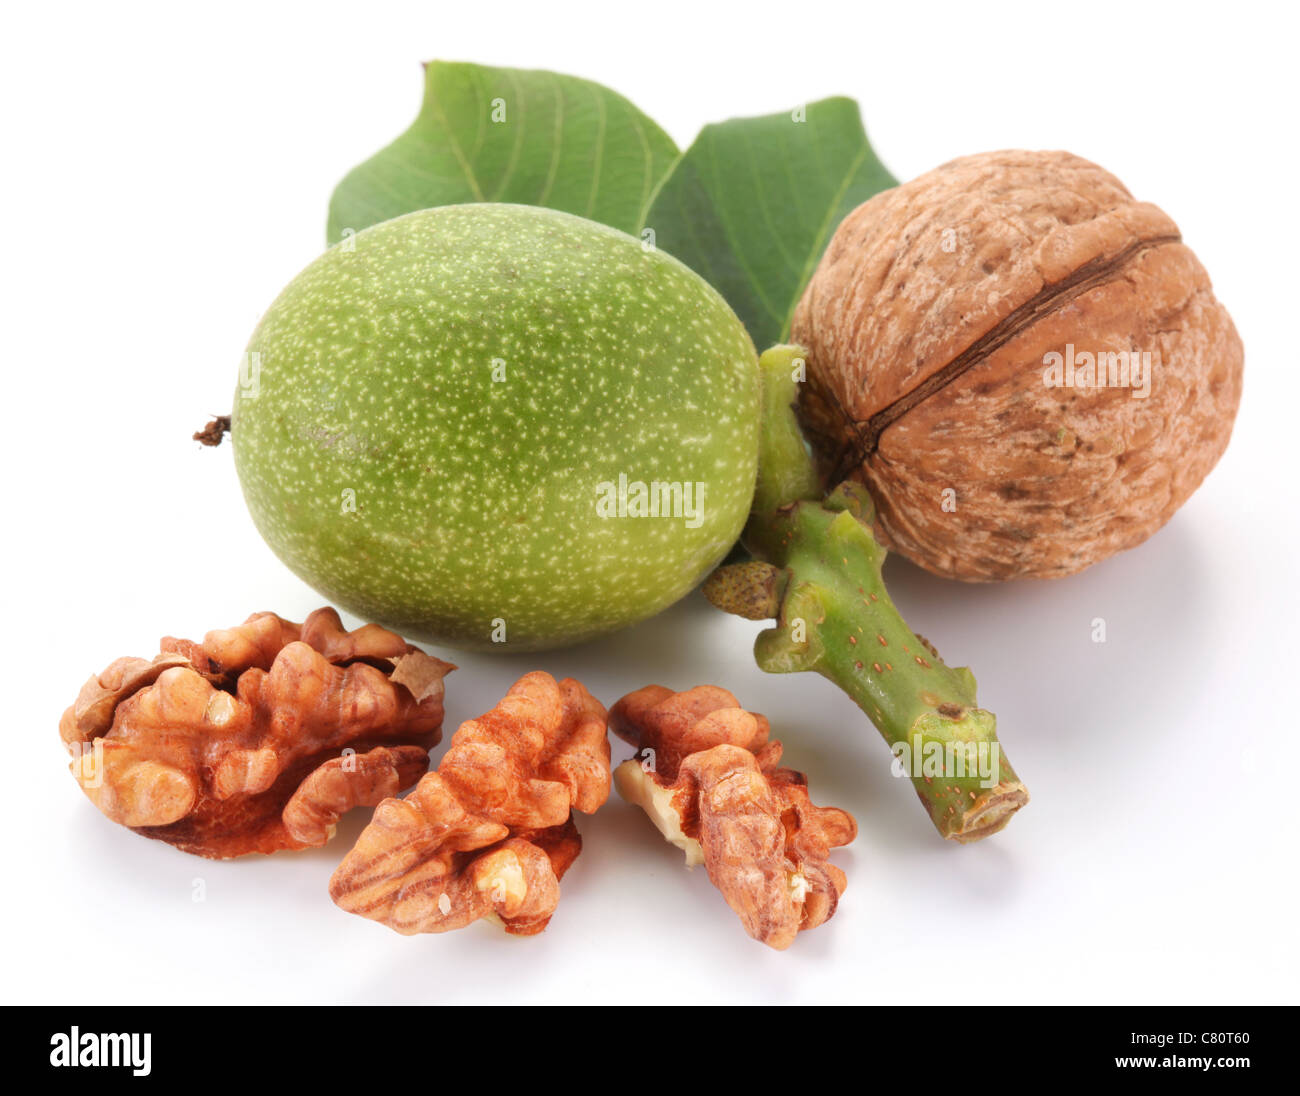 Green walnut; peeled walnut and its kernels. Isolated on a white background. - Stock Image